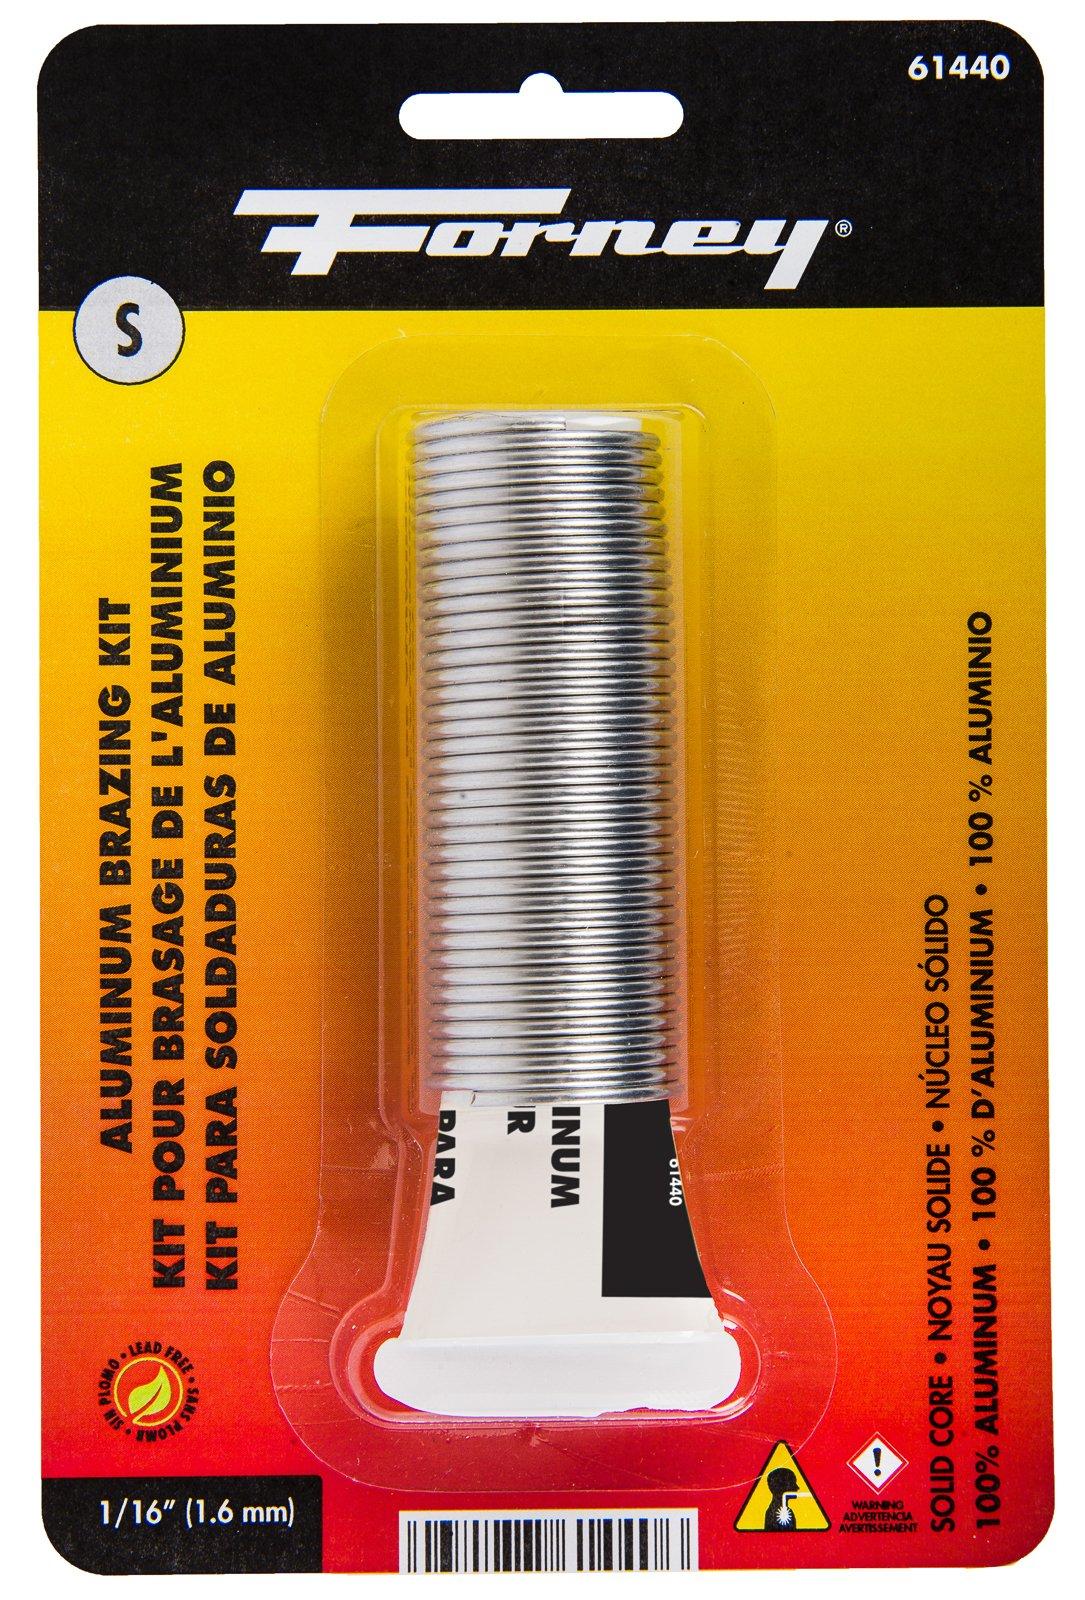 Amazon.com: Forney: Specialty Solder